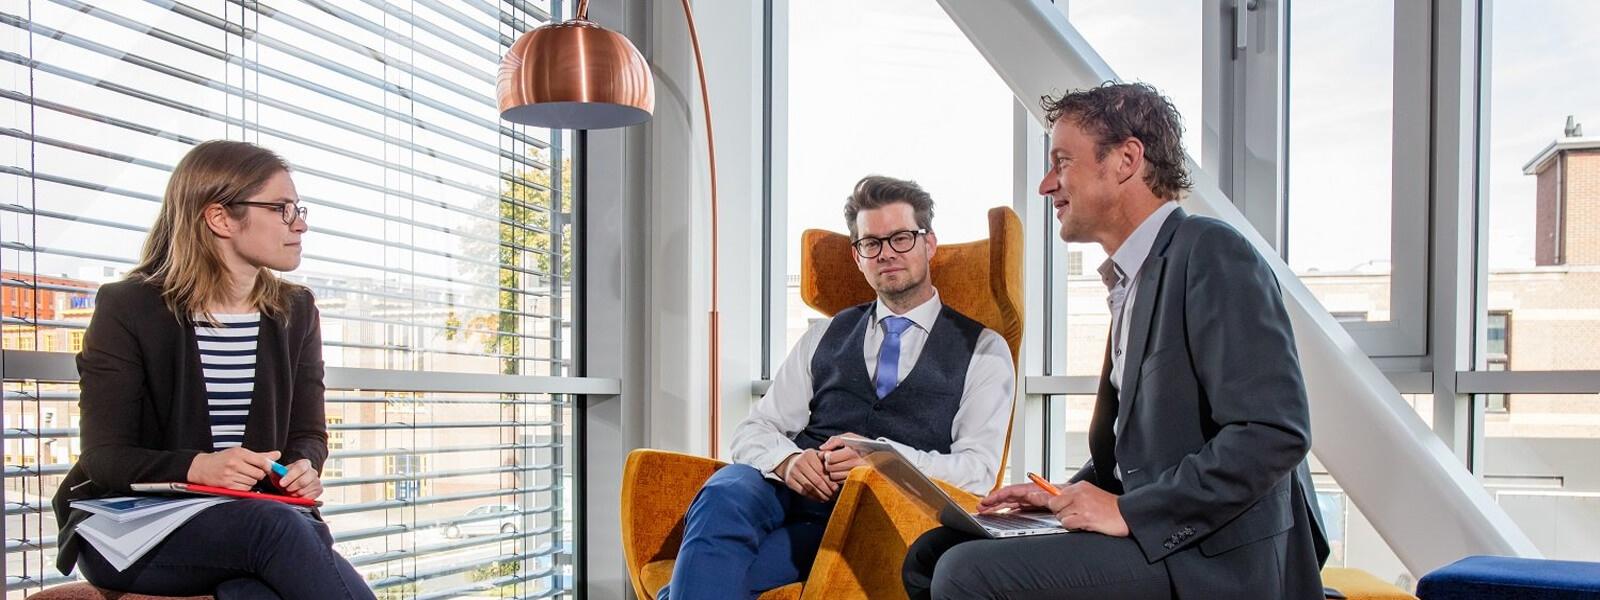 bachelor-human resourses management- studyinholland-universitiesofappliedsciences-saxion-enschede-holland